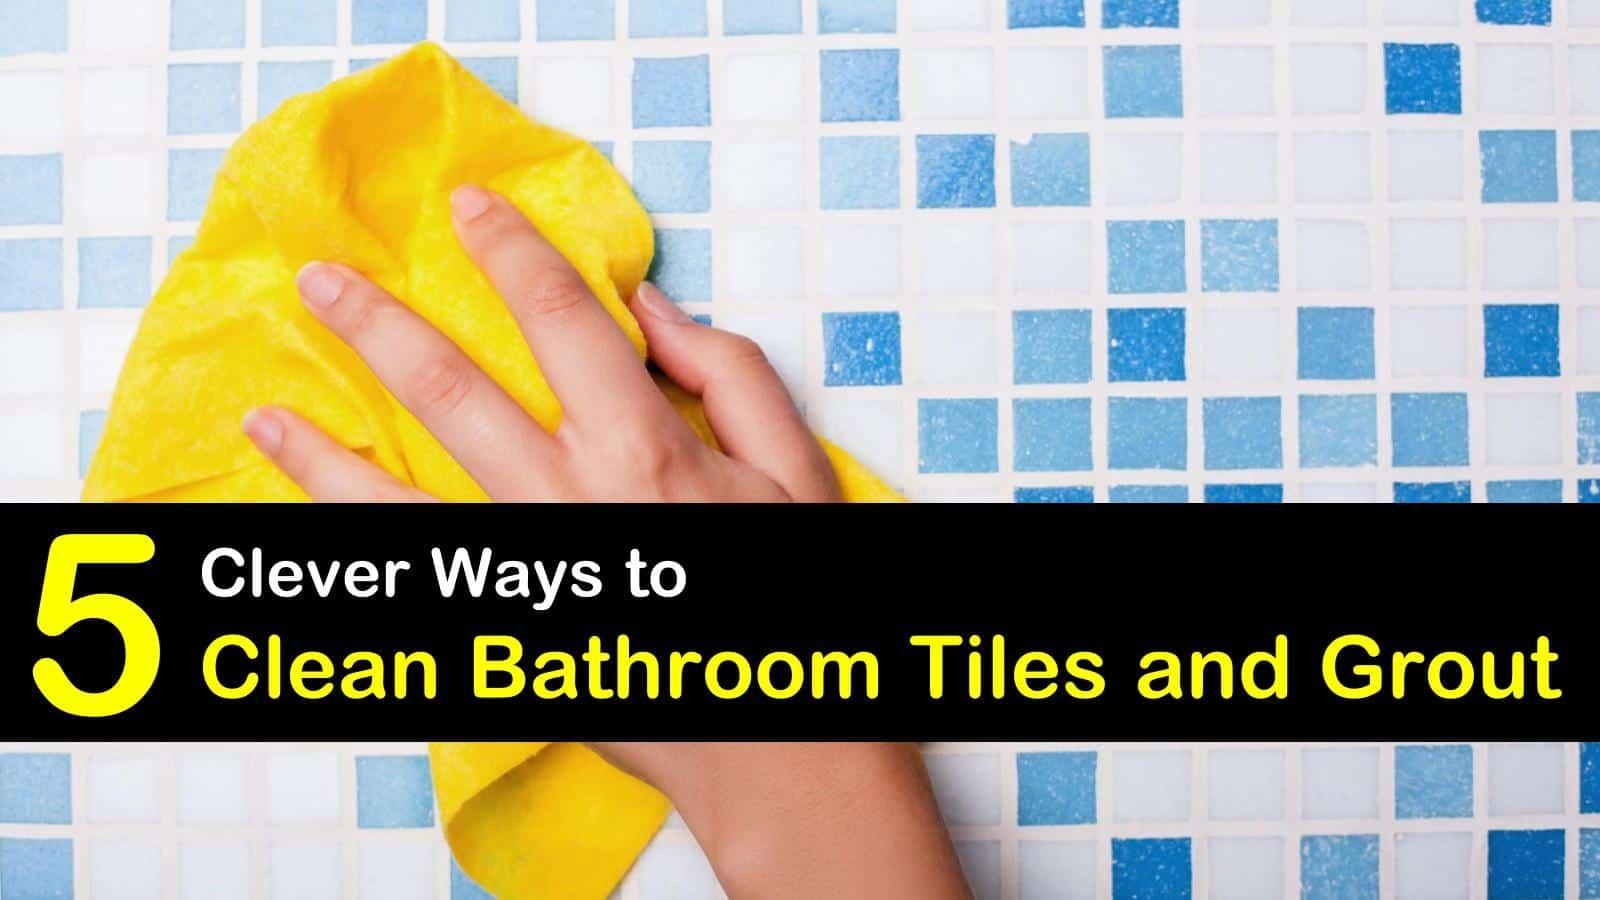 how to clean bathroom tile titleimg1